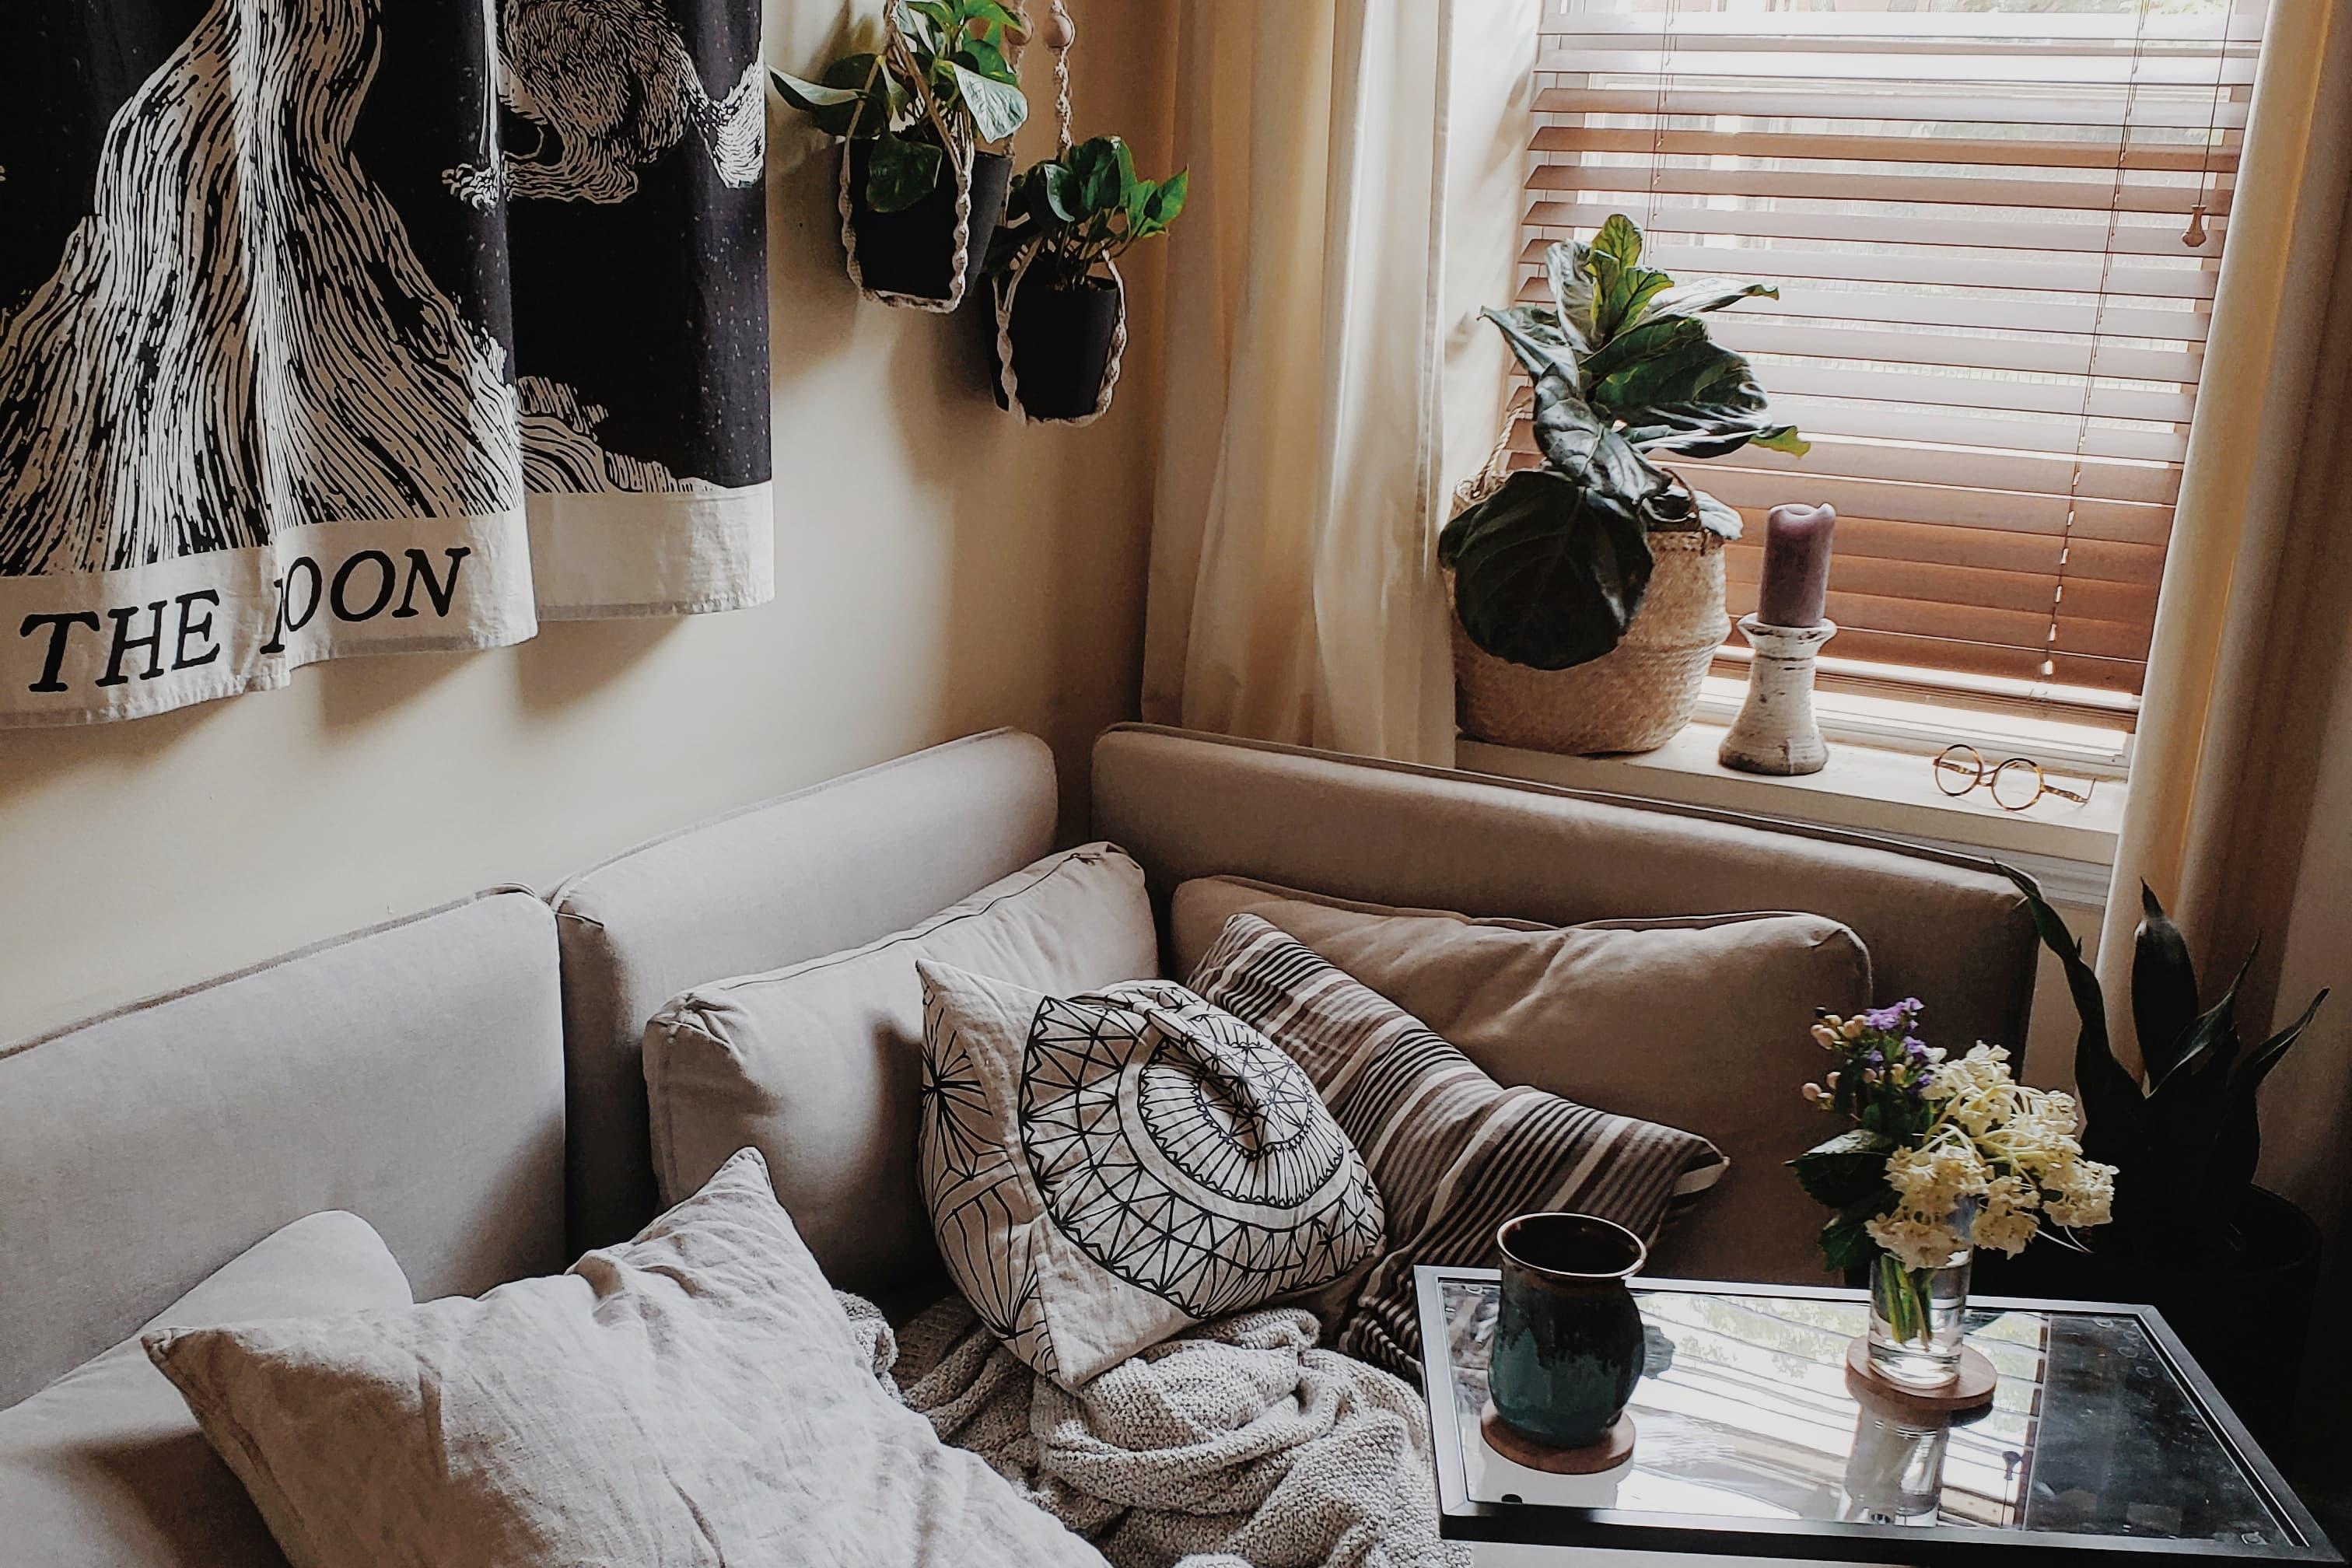 A Petite Philadelphia Studio Apartment Is 275 Square Feet of Style